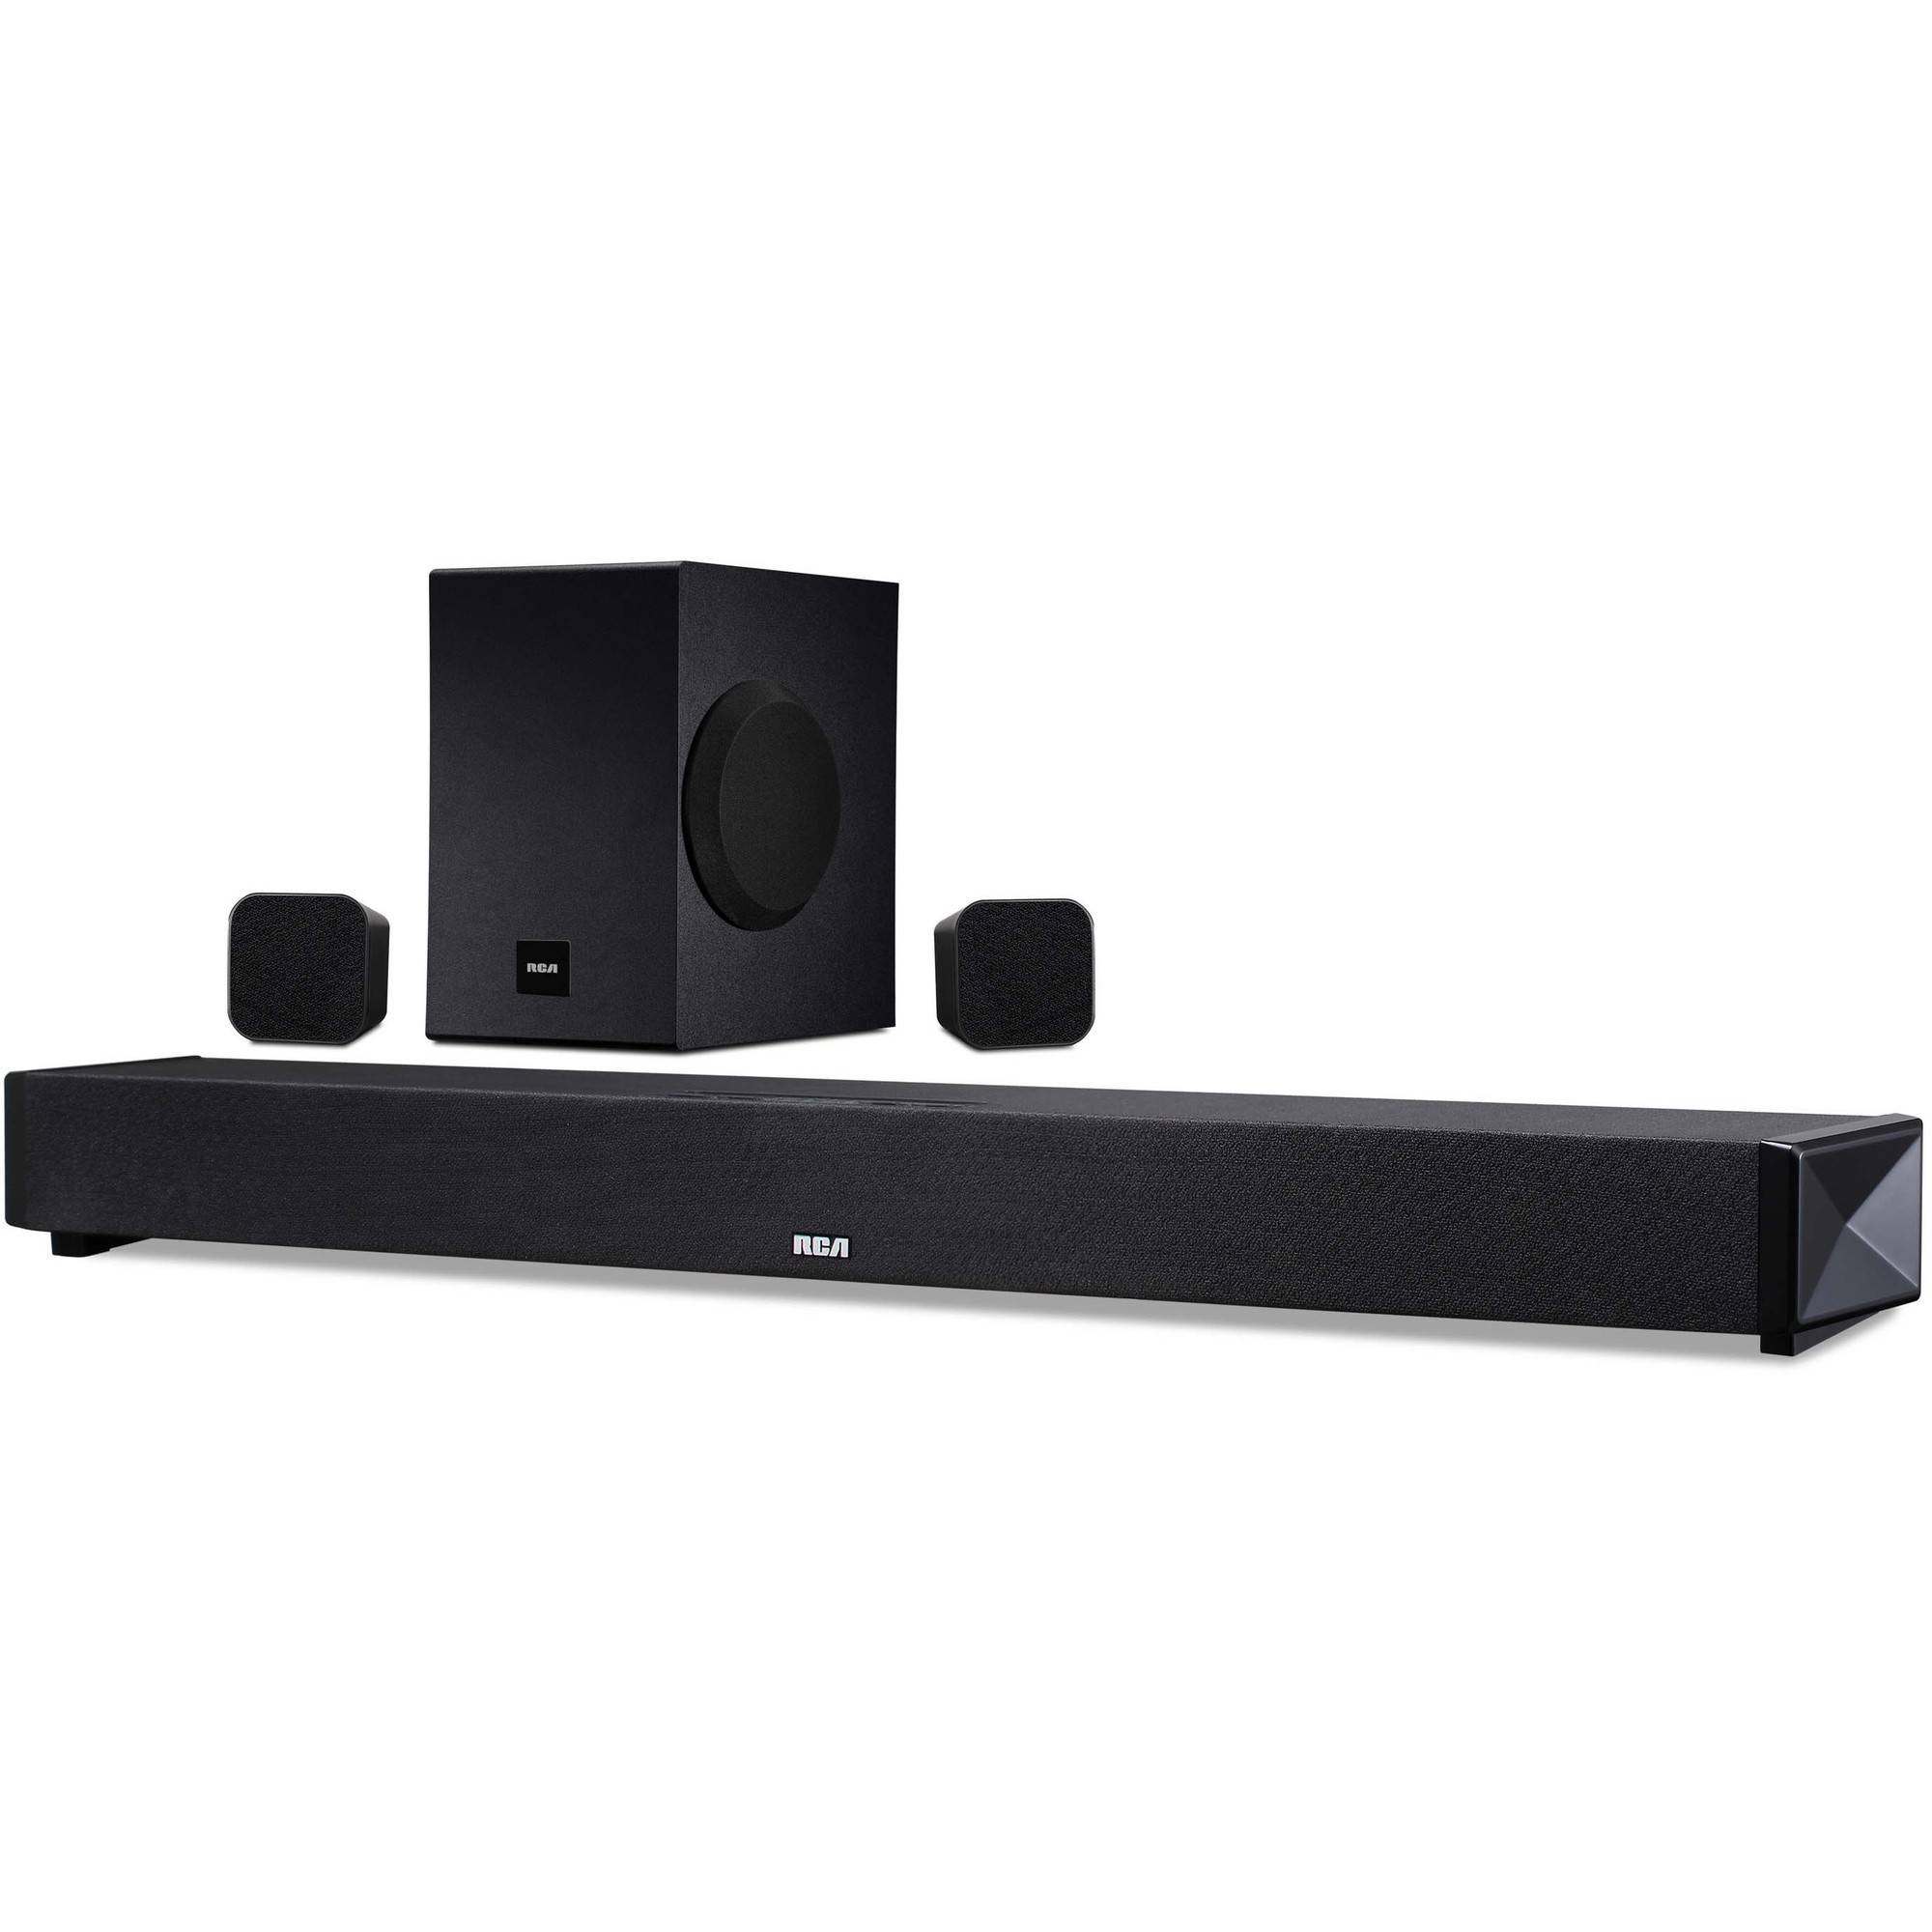 Rca 37 51ch Sound Bar 200w Bluetooth Whole Home Surround Wiring